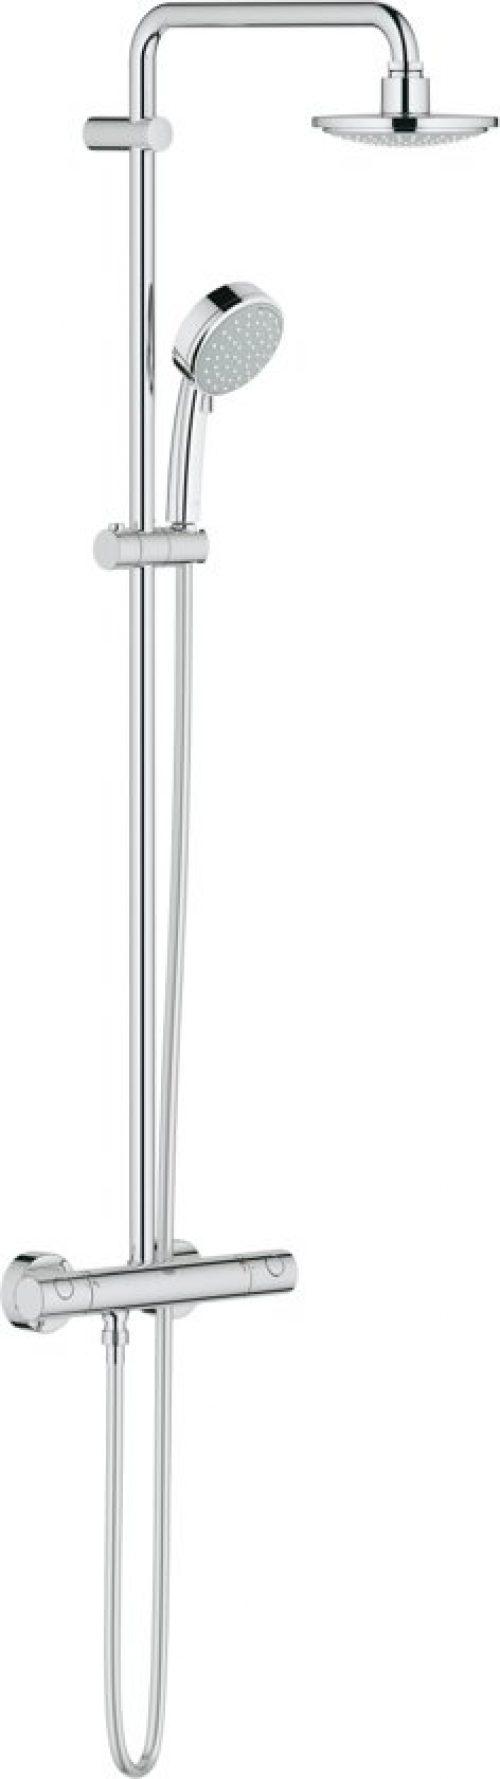 GROHE New Tempesta Cosmopolitan Douchesysteem - Regendouche ø 16 cm - Inclusief thermostaatkraan - 15 cm hartafstand